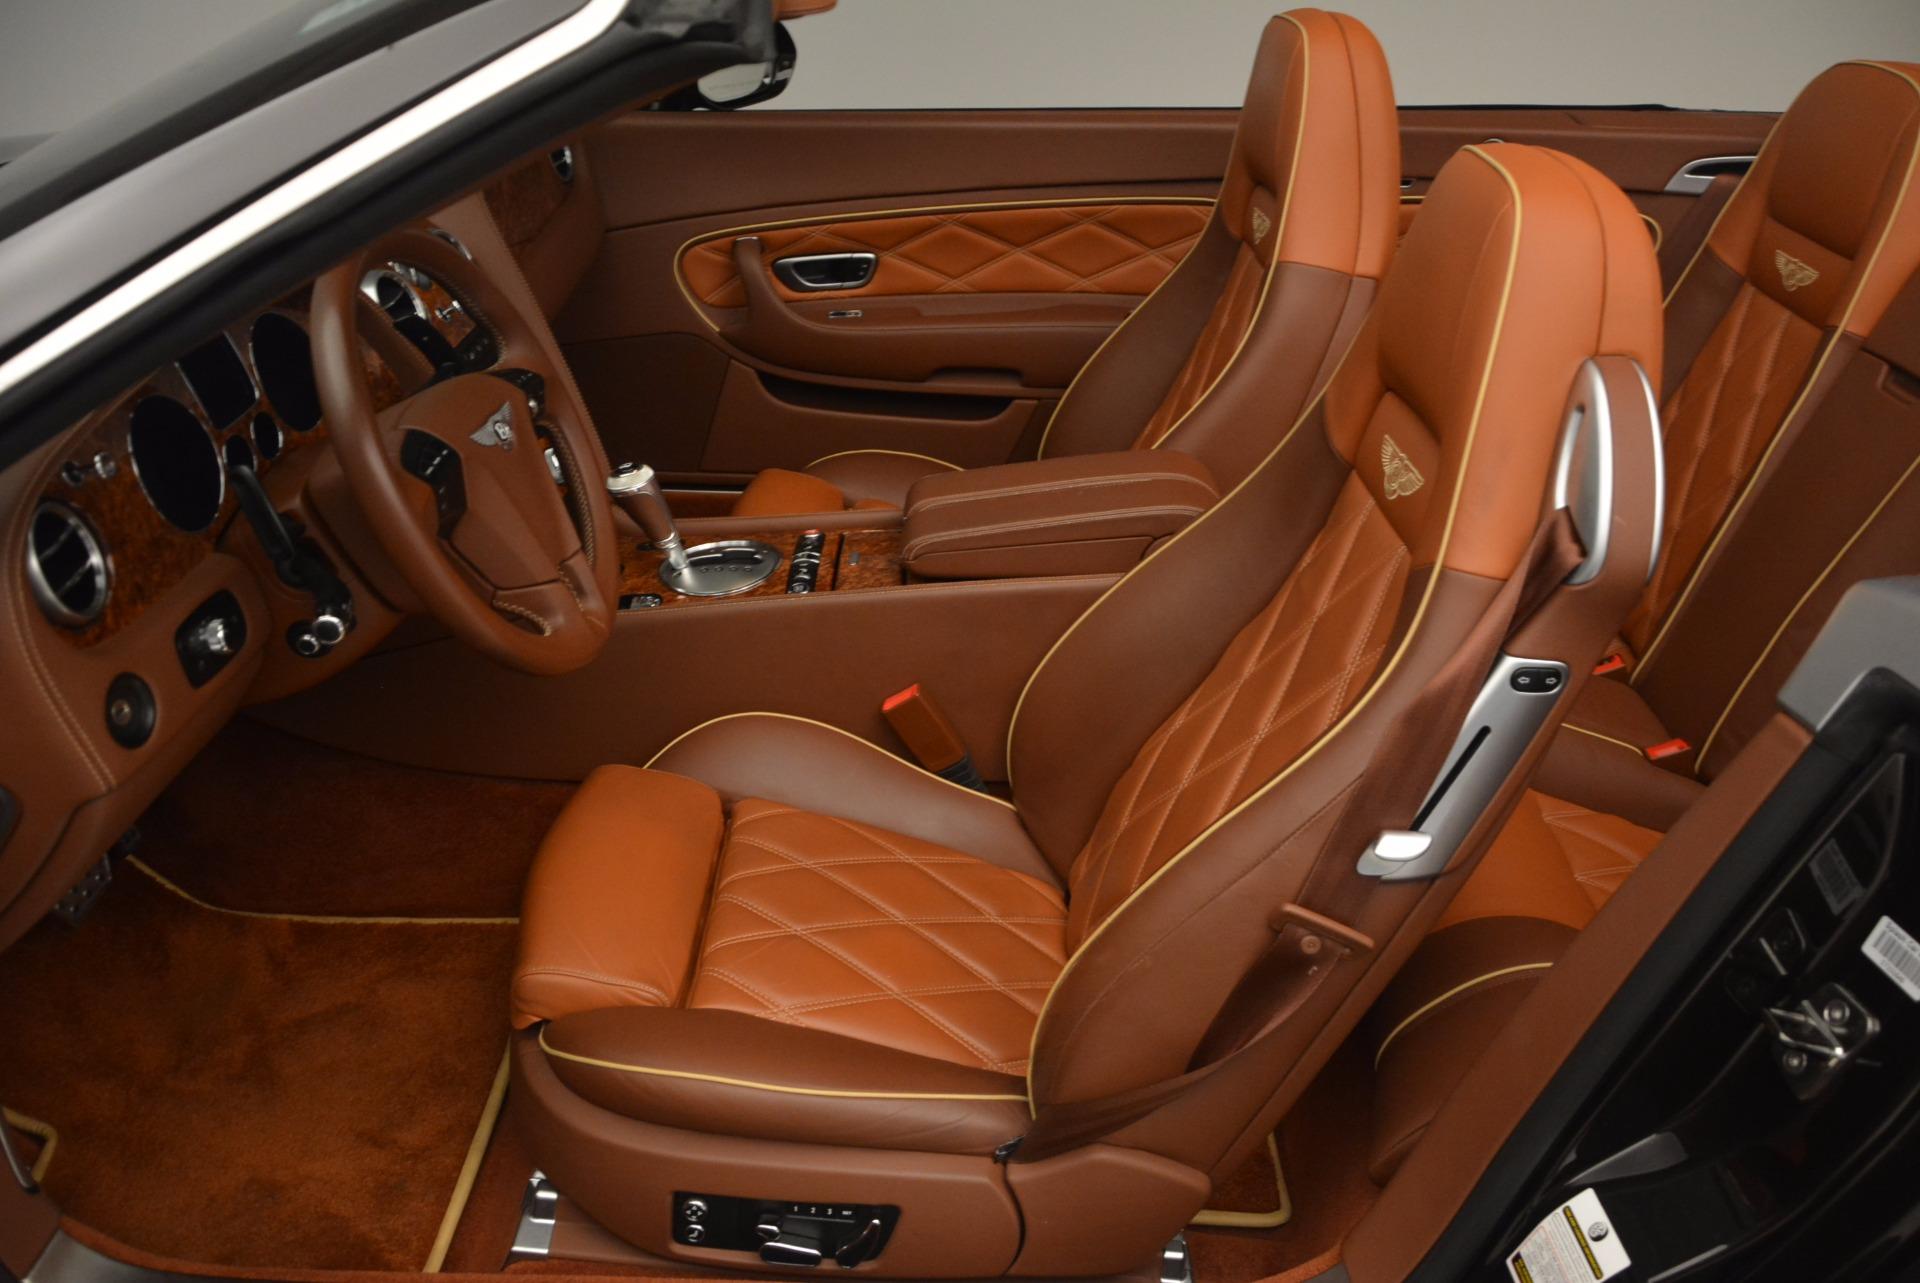 Used 2010 Bentley Continental GT Series 51 For Sale In Westport, CT 1222_p33